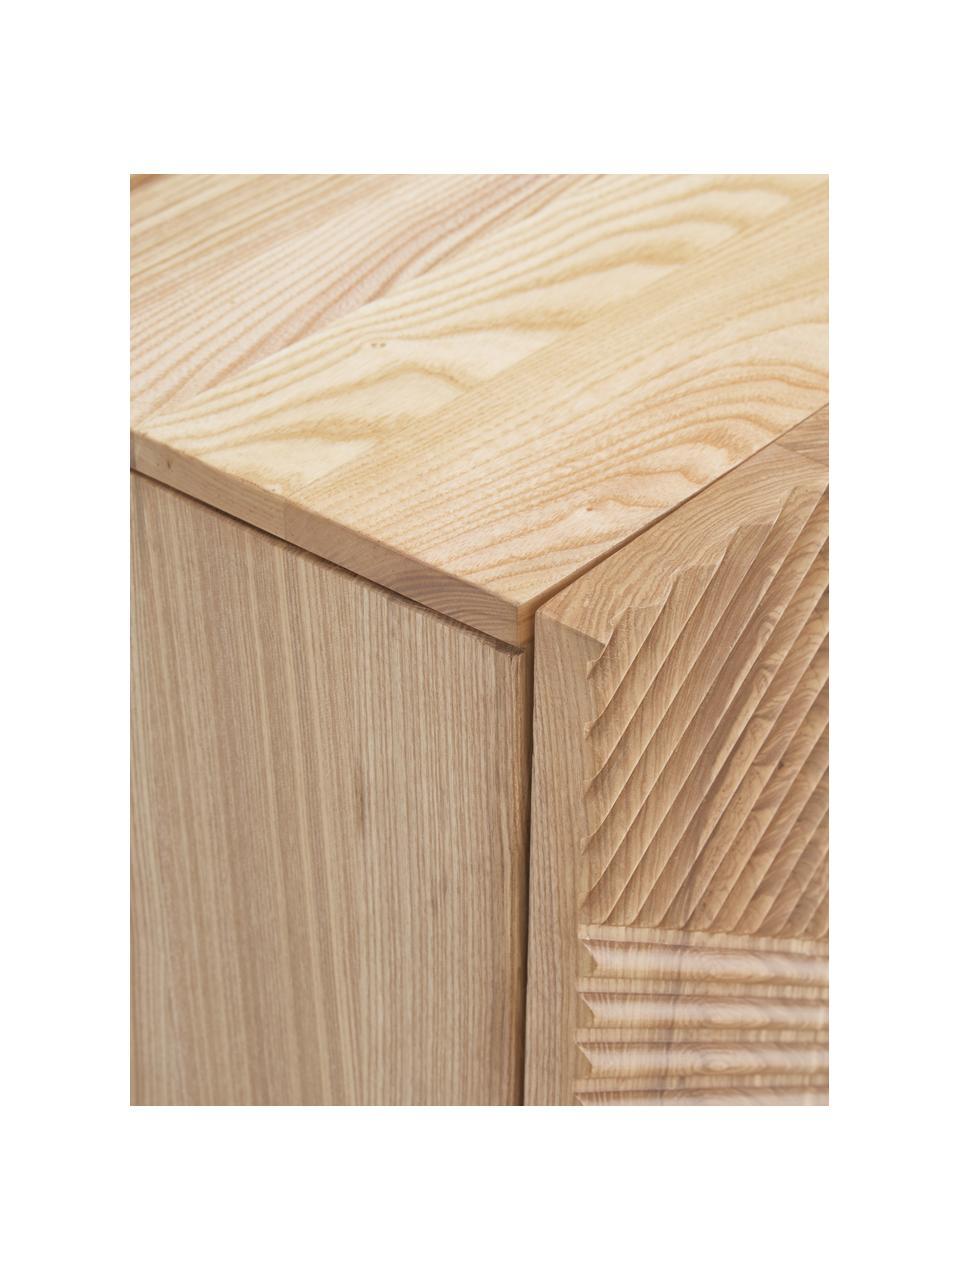 Lowboard Louis aus massivem Eschenholz mit Türen, Eschenholz, 180 x 55 cm